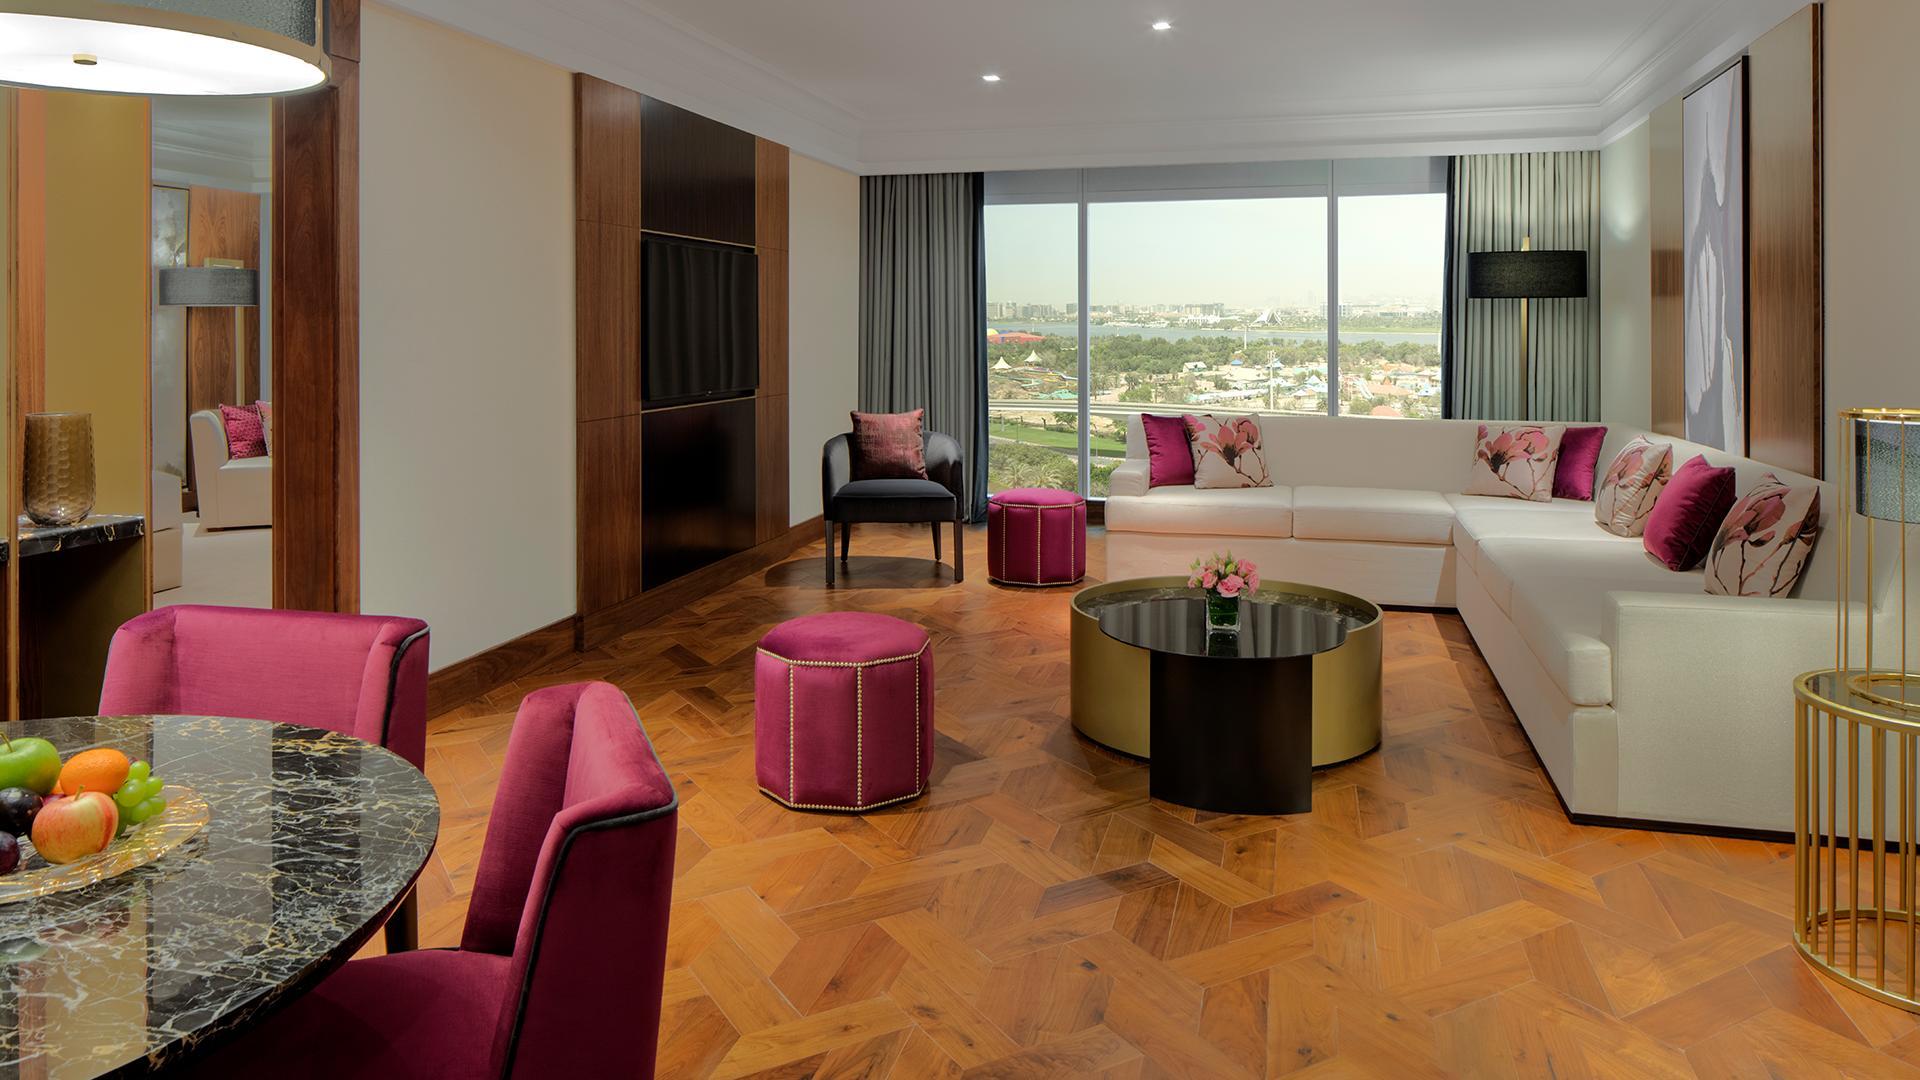 1 Bedroom Grand Suite with Garden View image 1 at Grand Hyatt Dubai by null, Dubai, United Arab Emirates